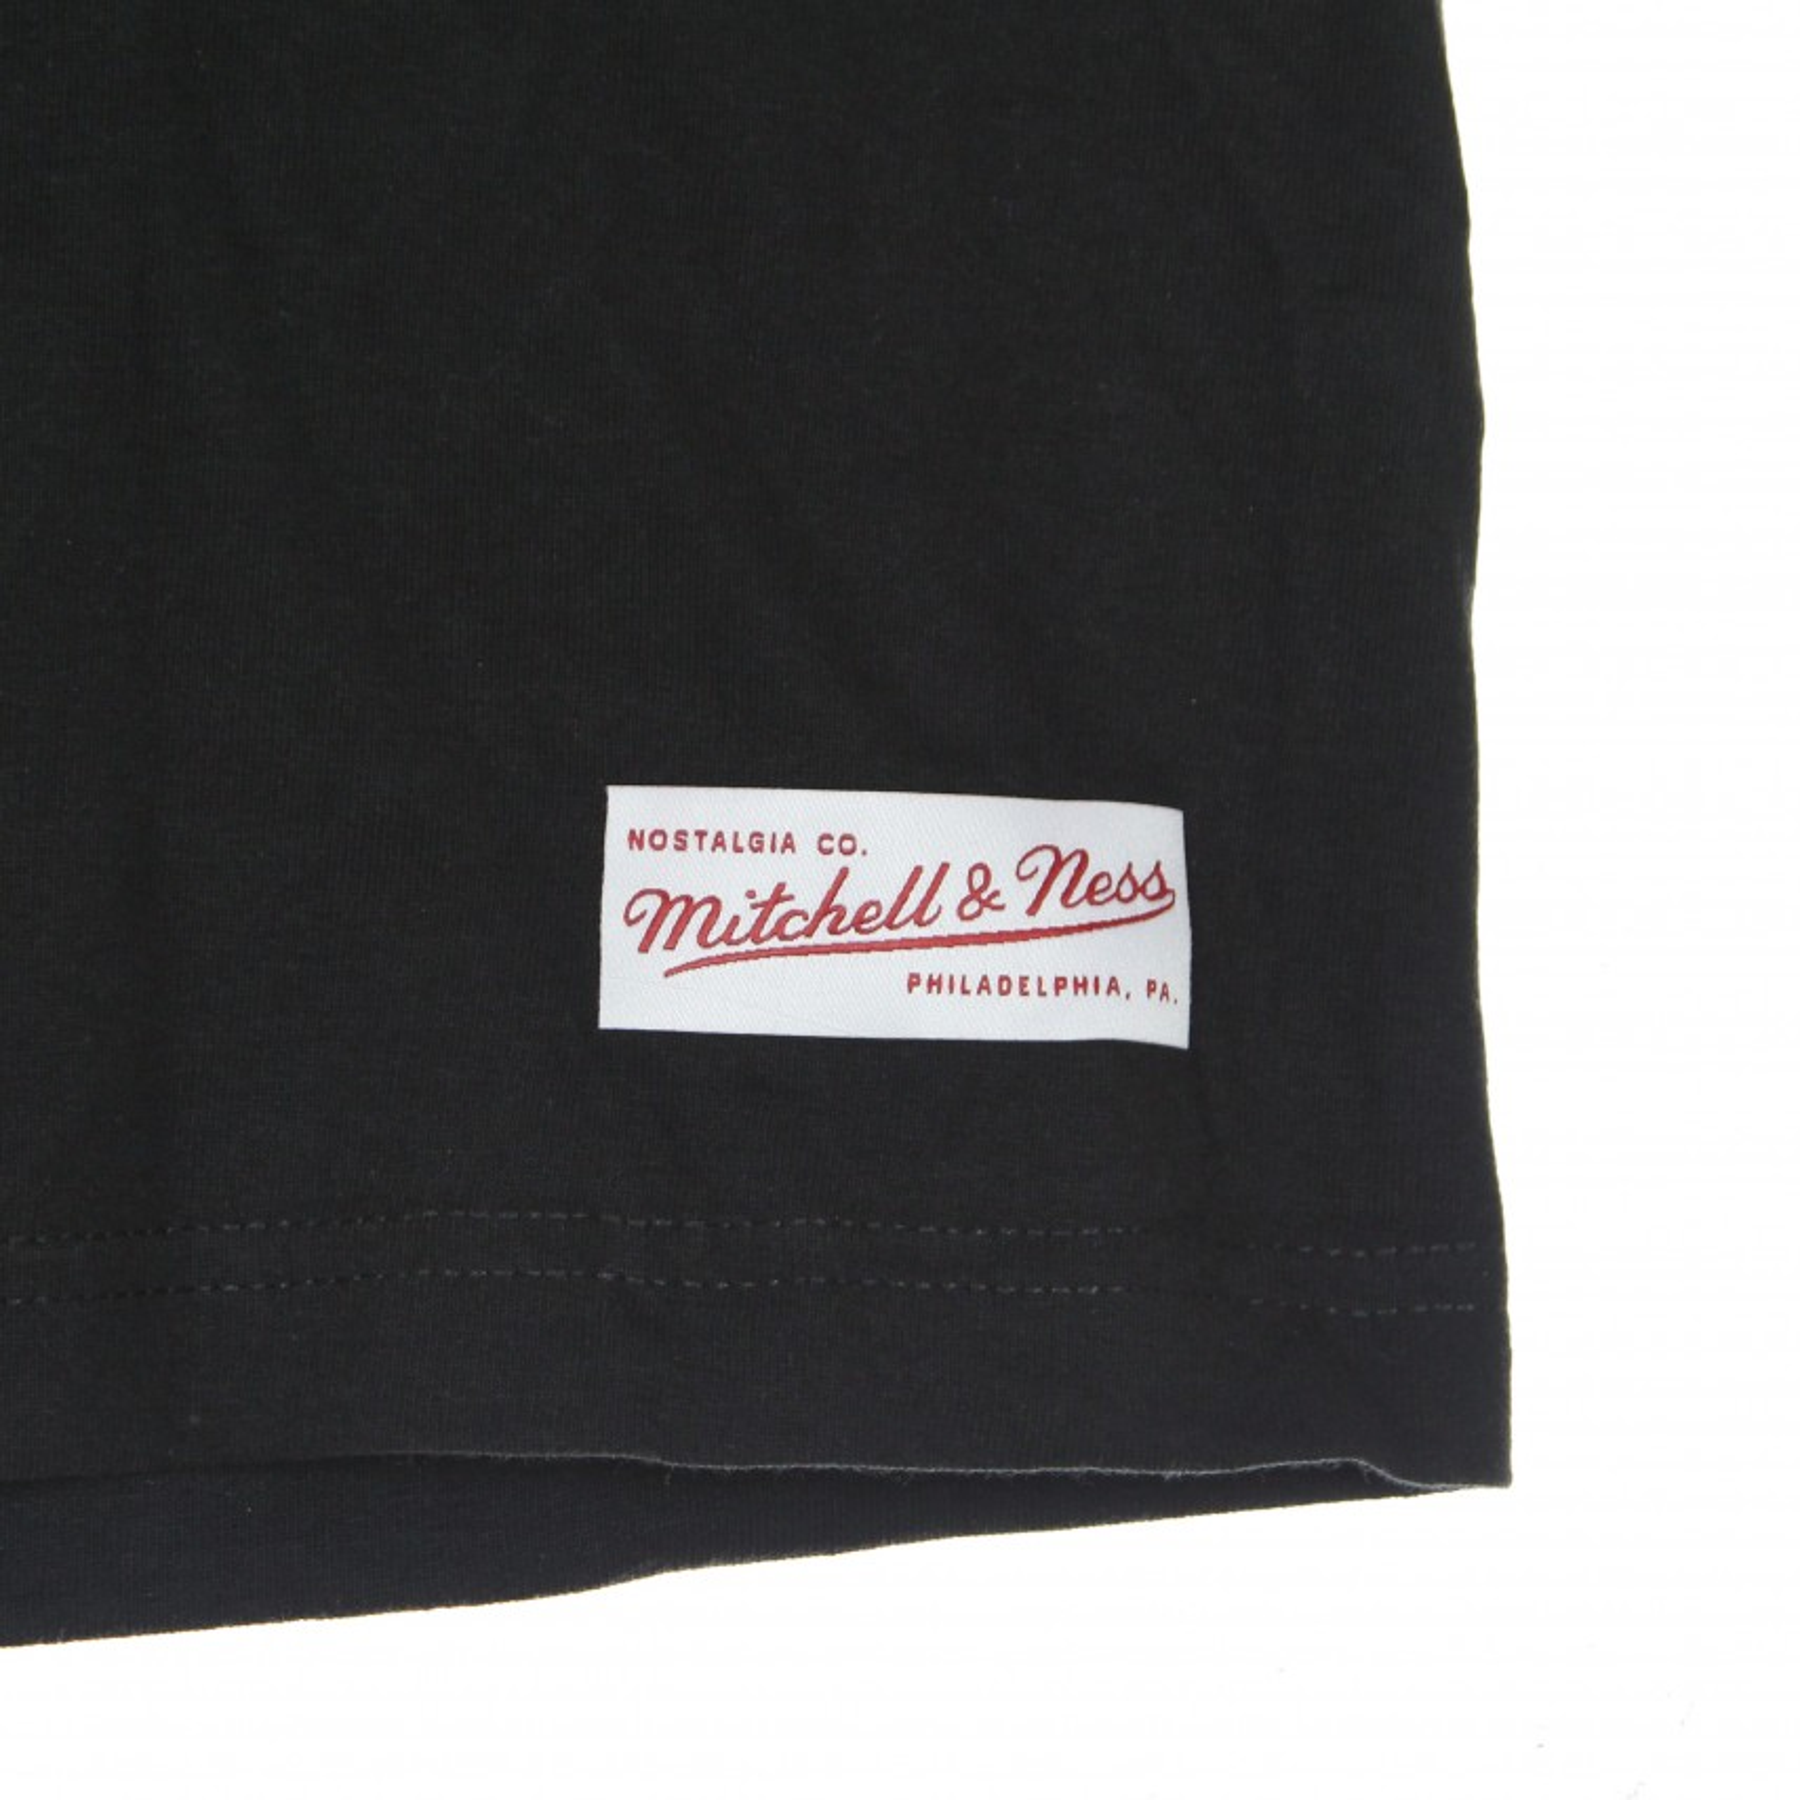 maglietta uomo legacy reborn tee x notorious b.i.g. XL